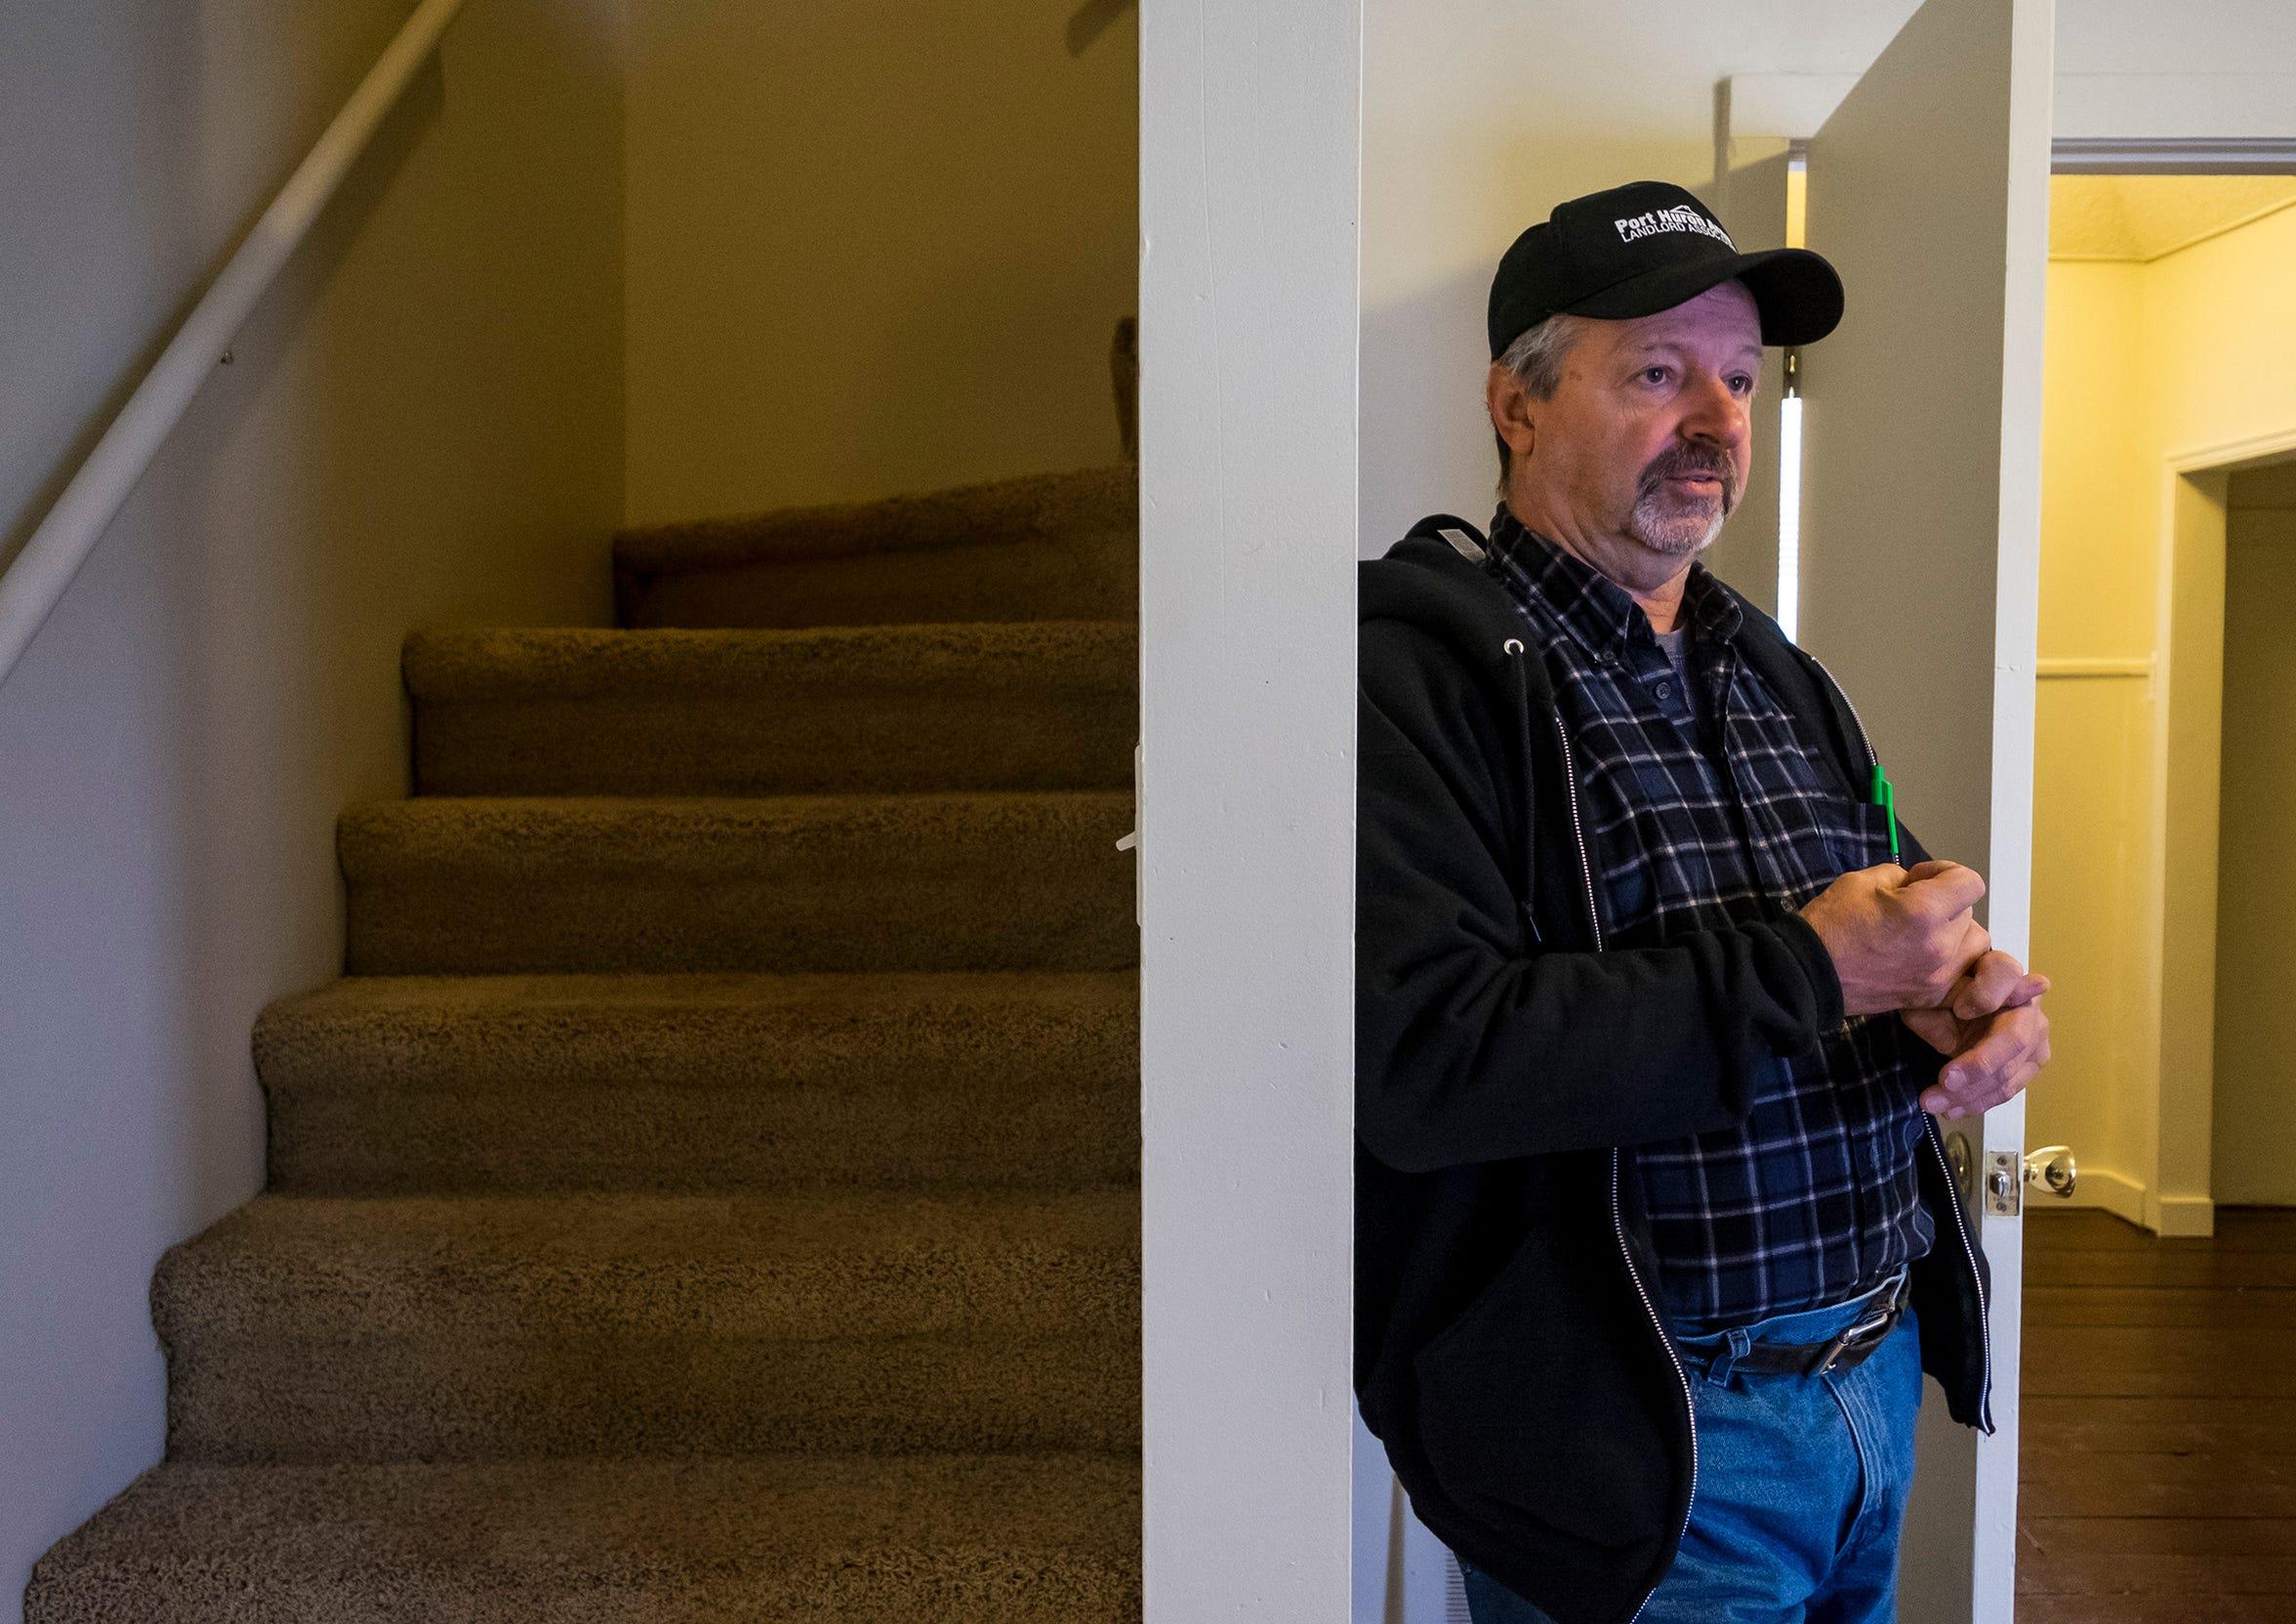 Port Huron Area Landlord Association President Mike Bodeis talks inside one of his Port Huron rental homes Friday, Nov. 16, 2018, before an inspection.